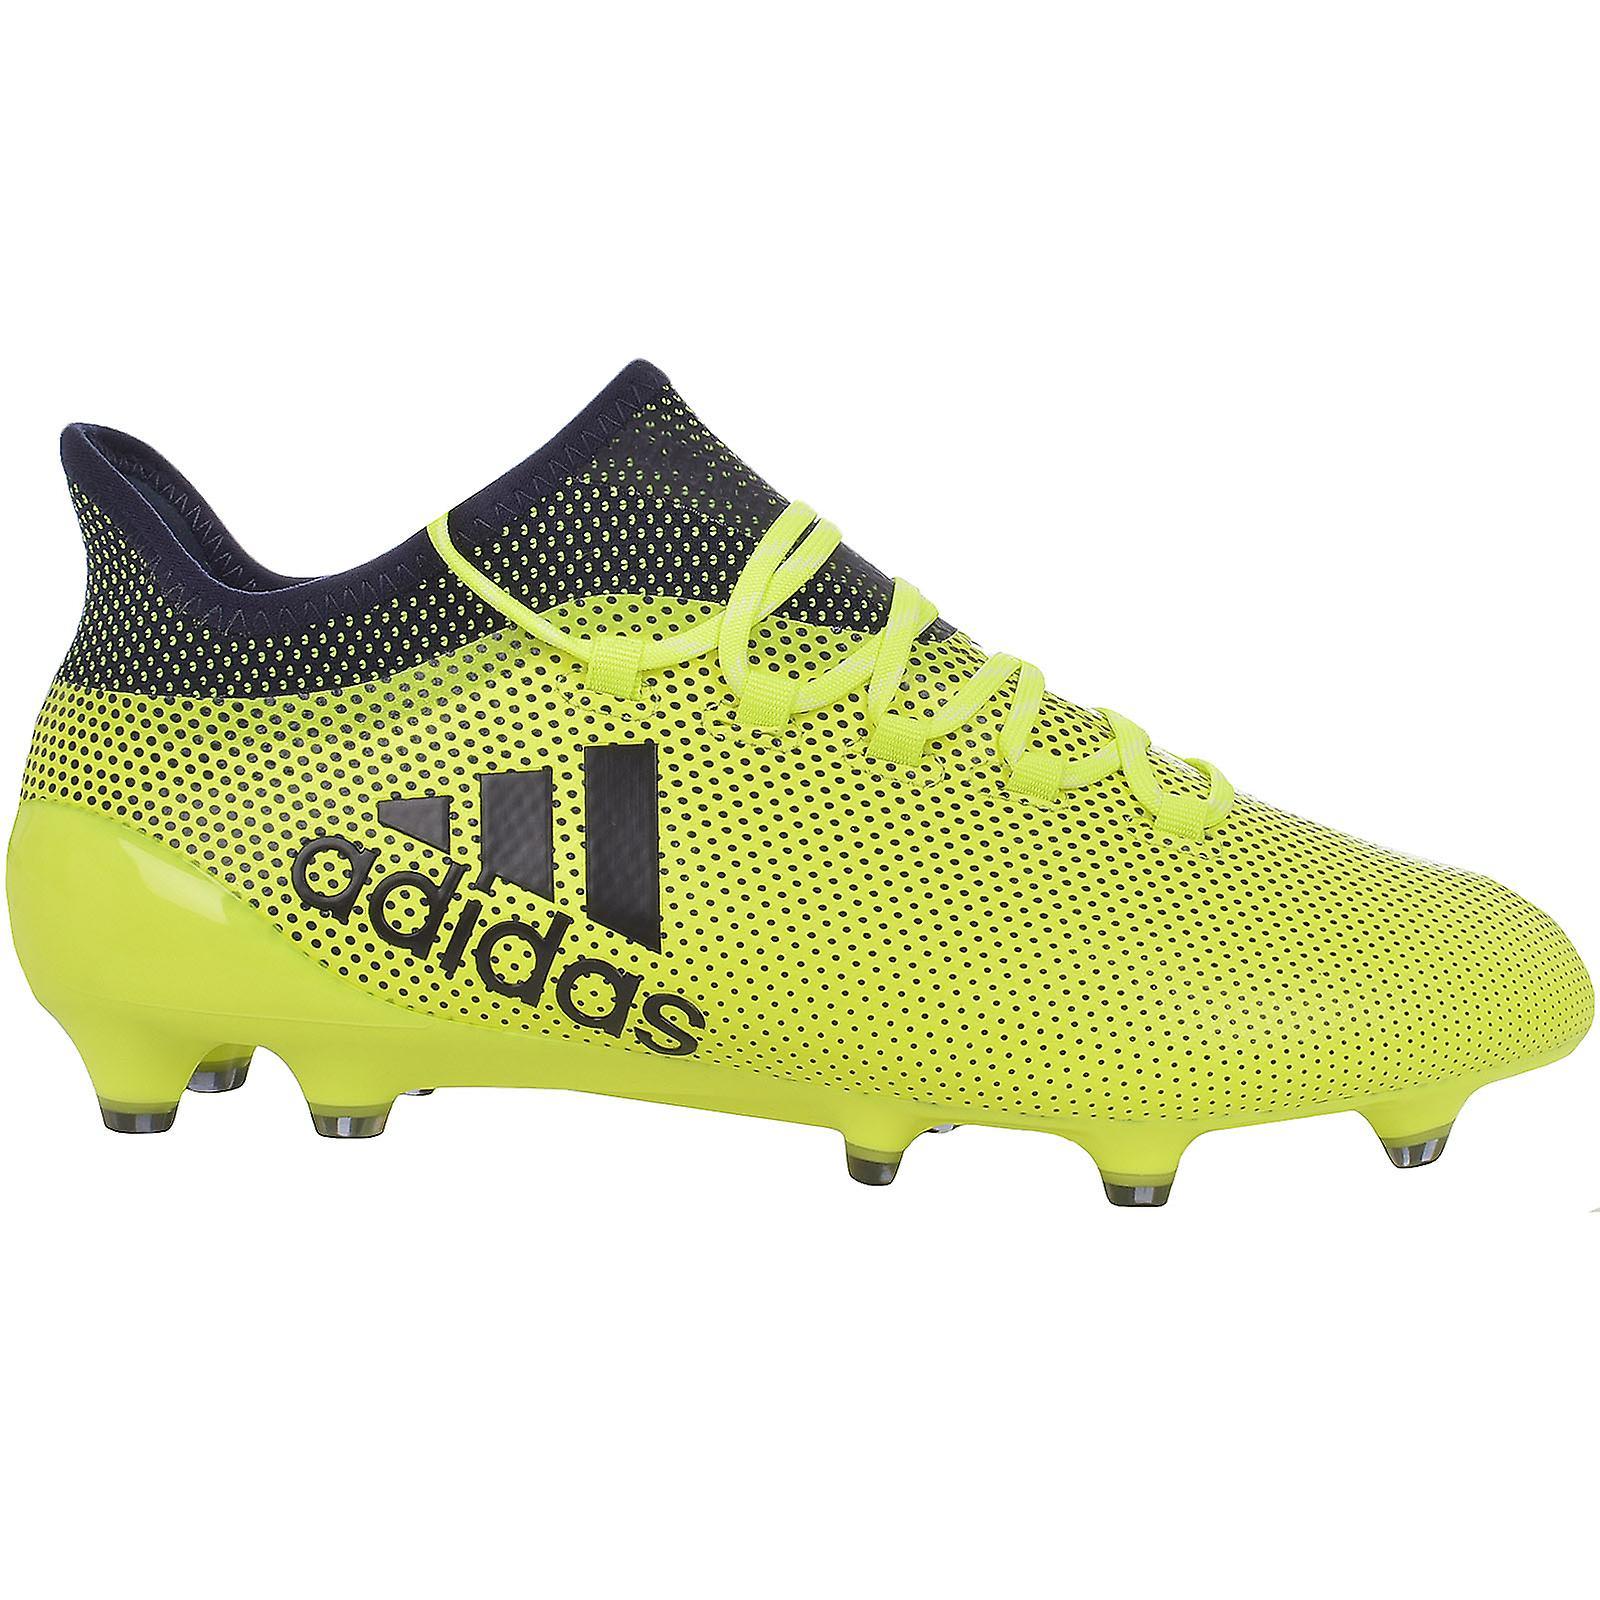 X ytelse Mens Sko 17 fotball gulFruugo FG Adidas Boots 1 Sport BWCorxde